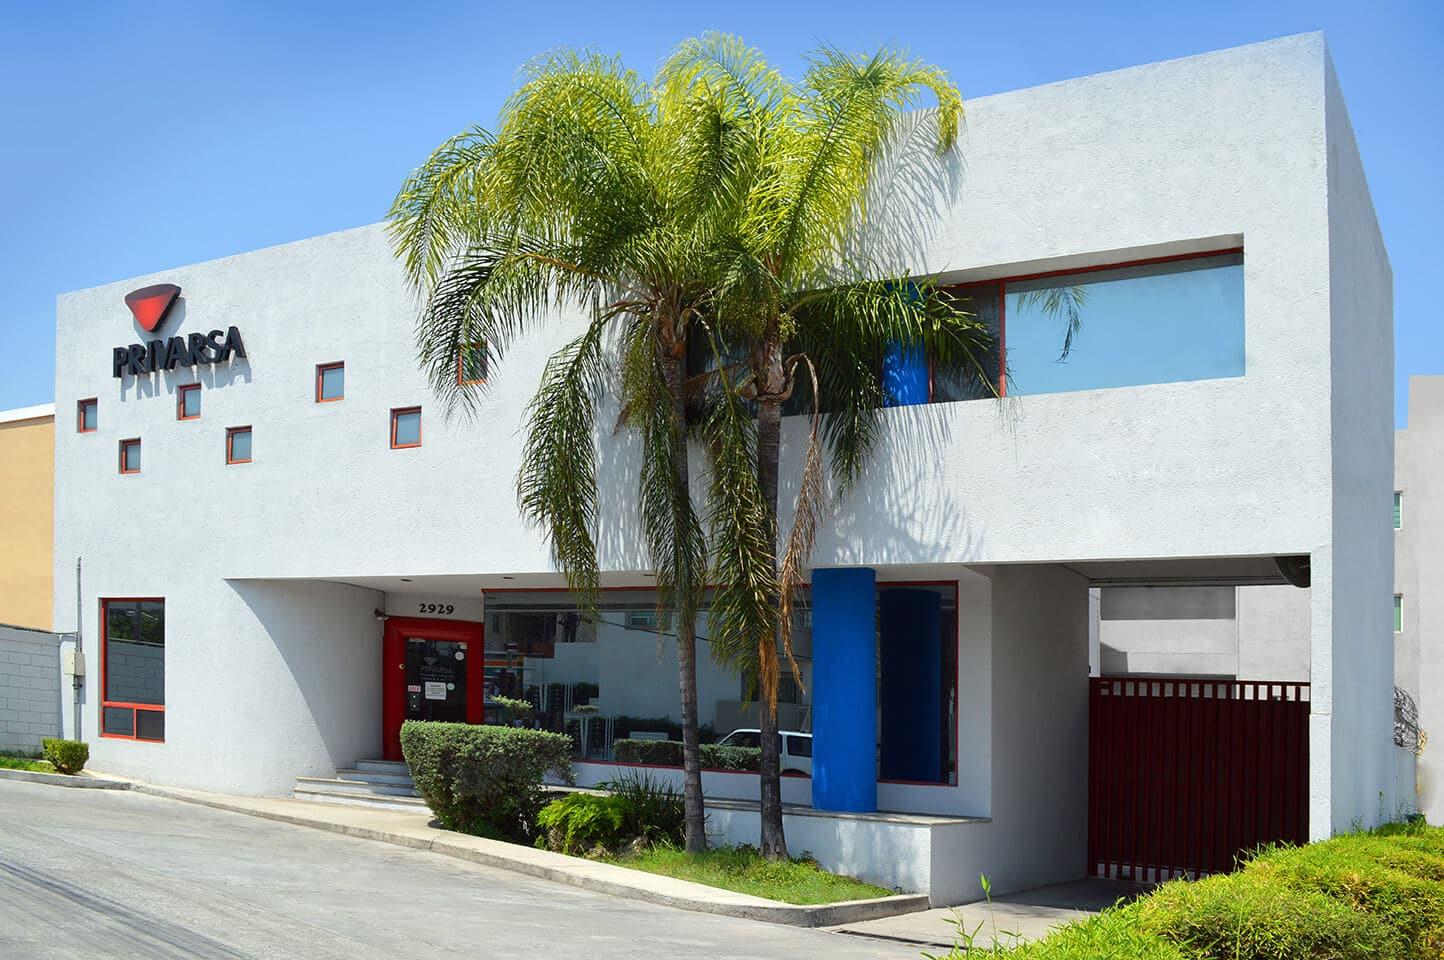 fachada privarsa monterrey (1)